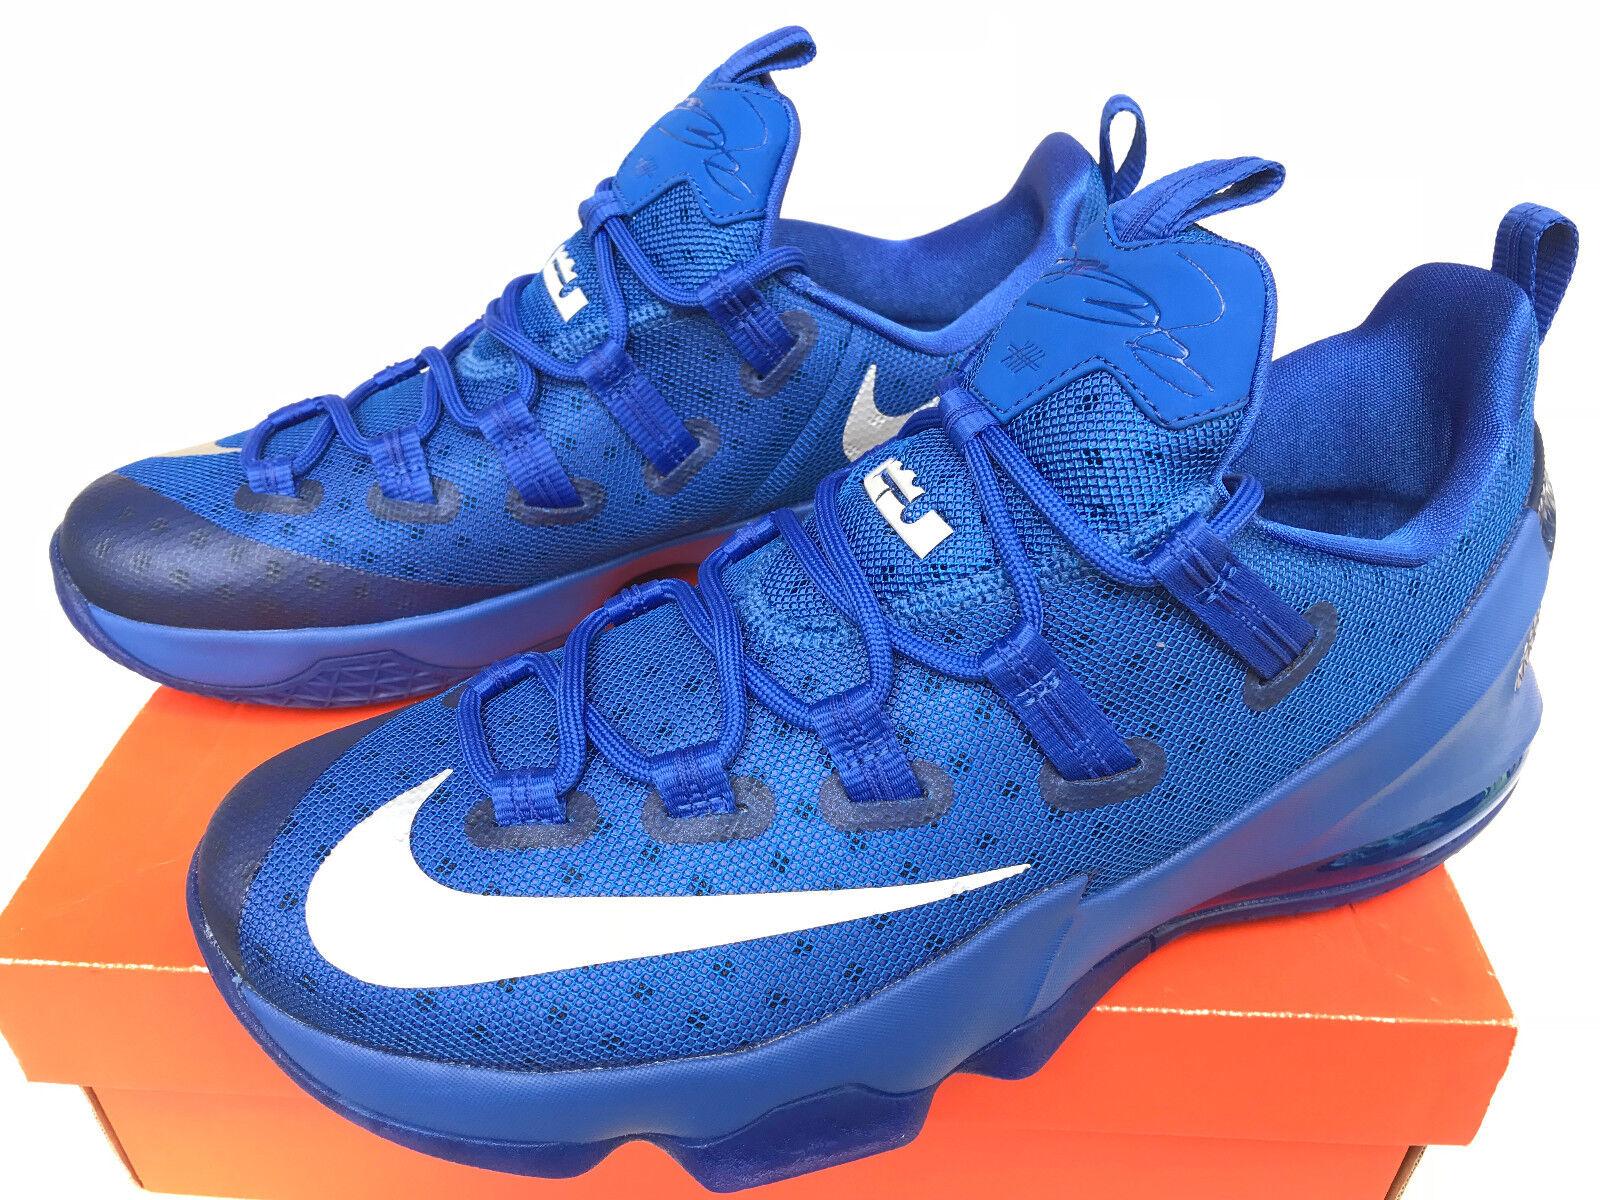 Nike lebron 831925-400 xiii 13 niedrig 831925-400 lebron kentucky royal basketball - schuhe für männer 13 neue 79a401